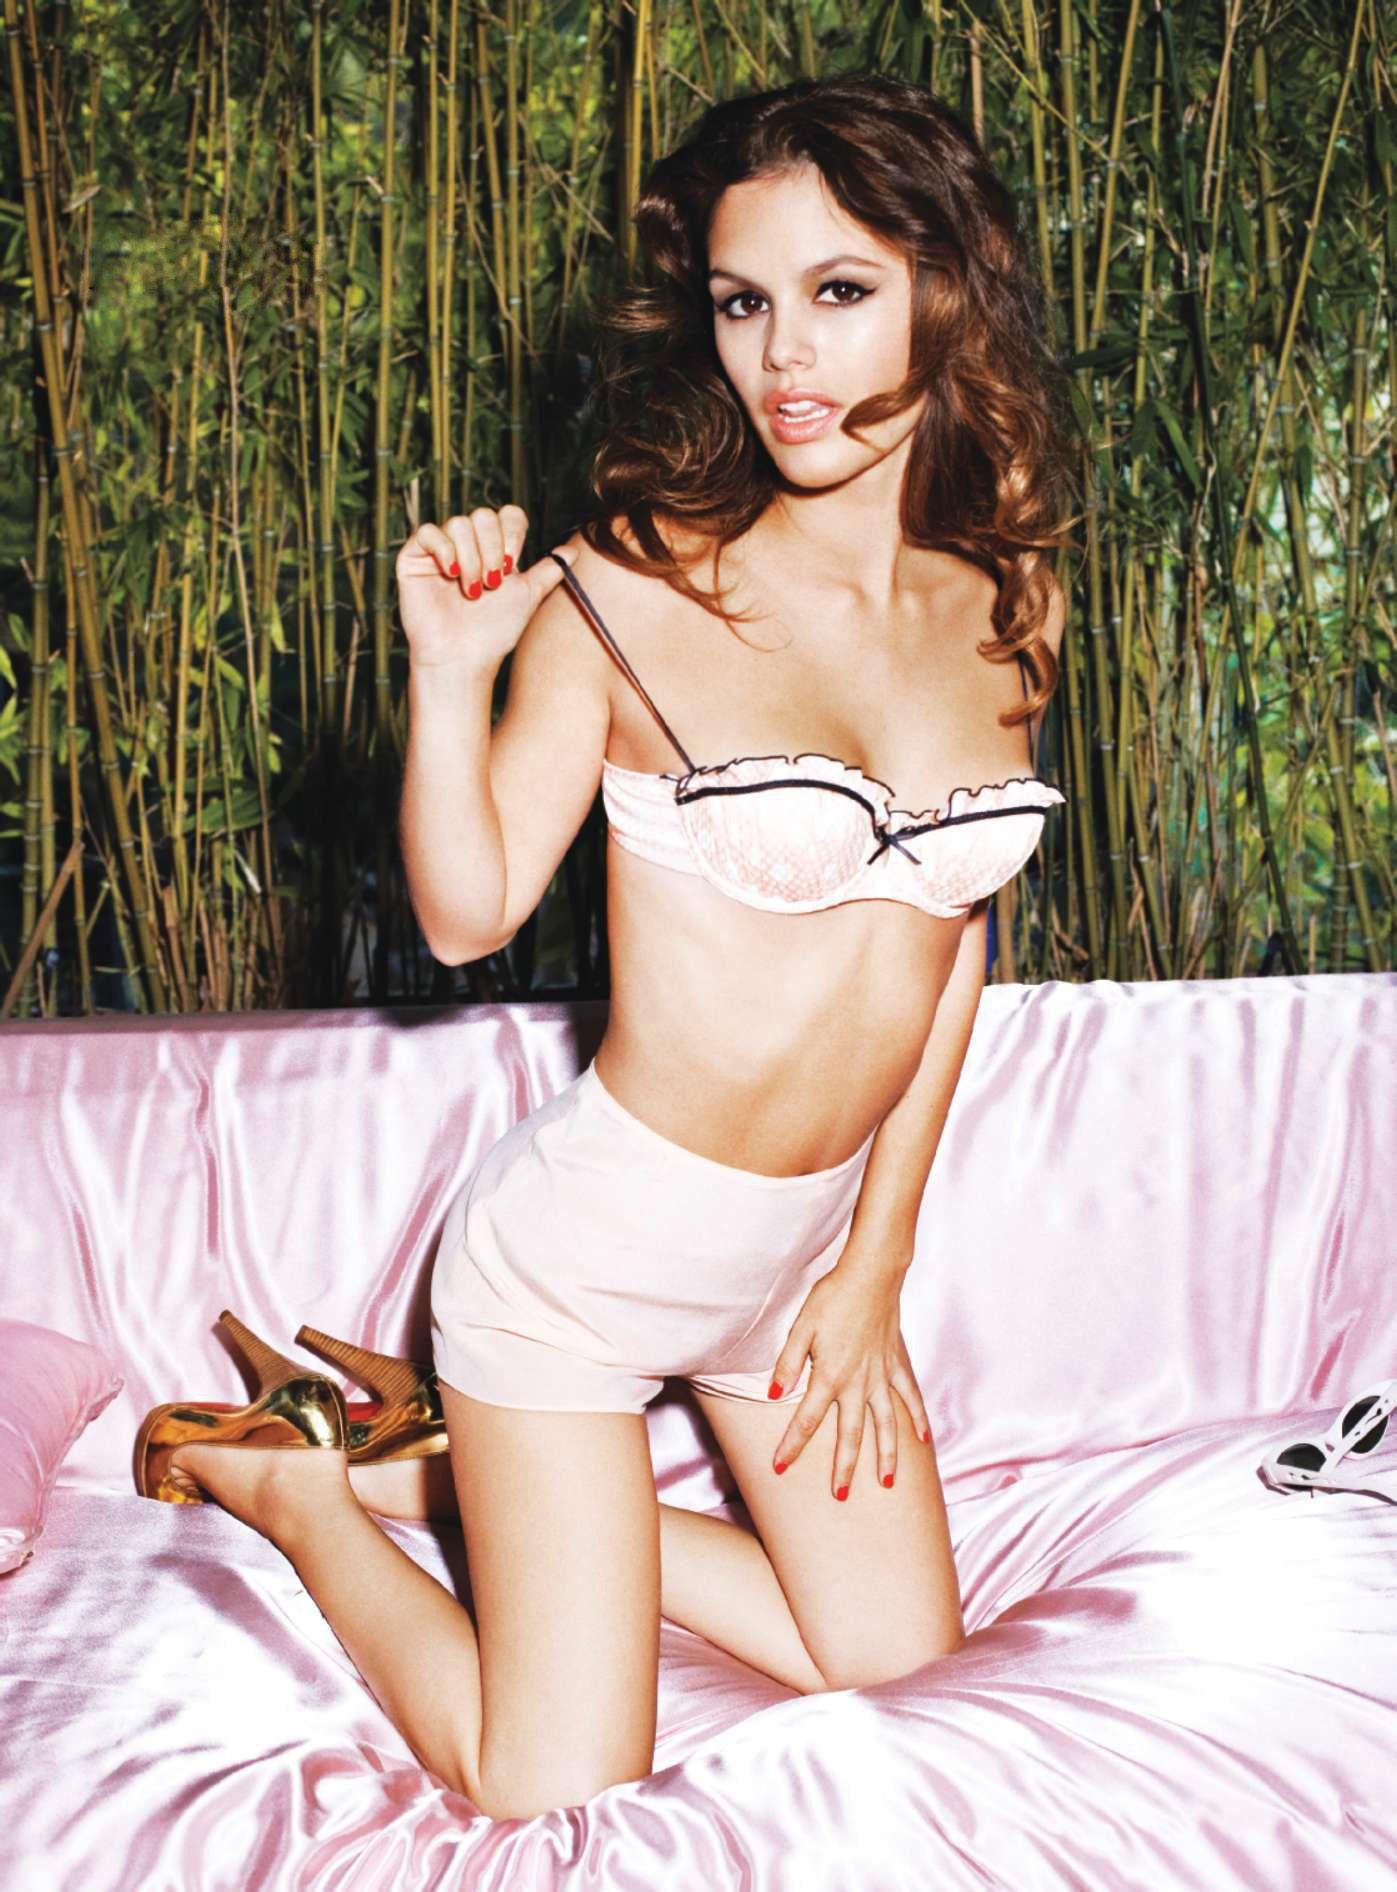 Maxim Hot 100 2010 - 46 Rachel Bilson